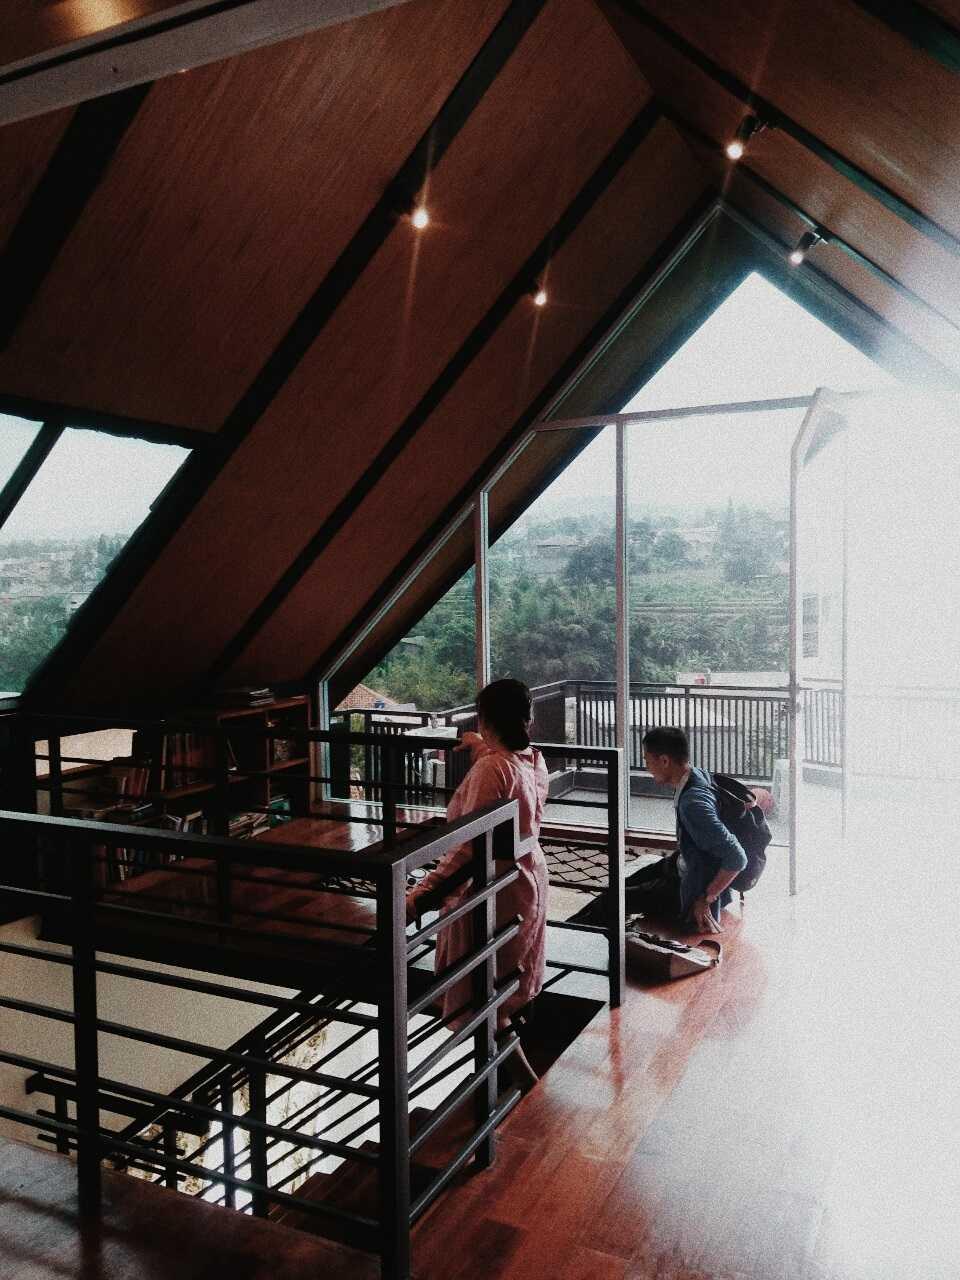 Qavah Architect Attic House Renovation Gegerkalong, Kec. Sukasari, Kota Bandung, Jawa Barat, Indonesia Gegerkalong, Kec. Sukasari, Kota Bandung, Jawa Barat, Indonesia Qavah-Architect-Attic-House-Renovation  90451